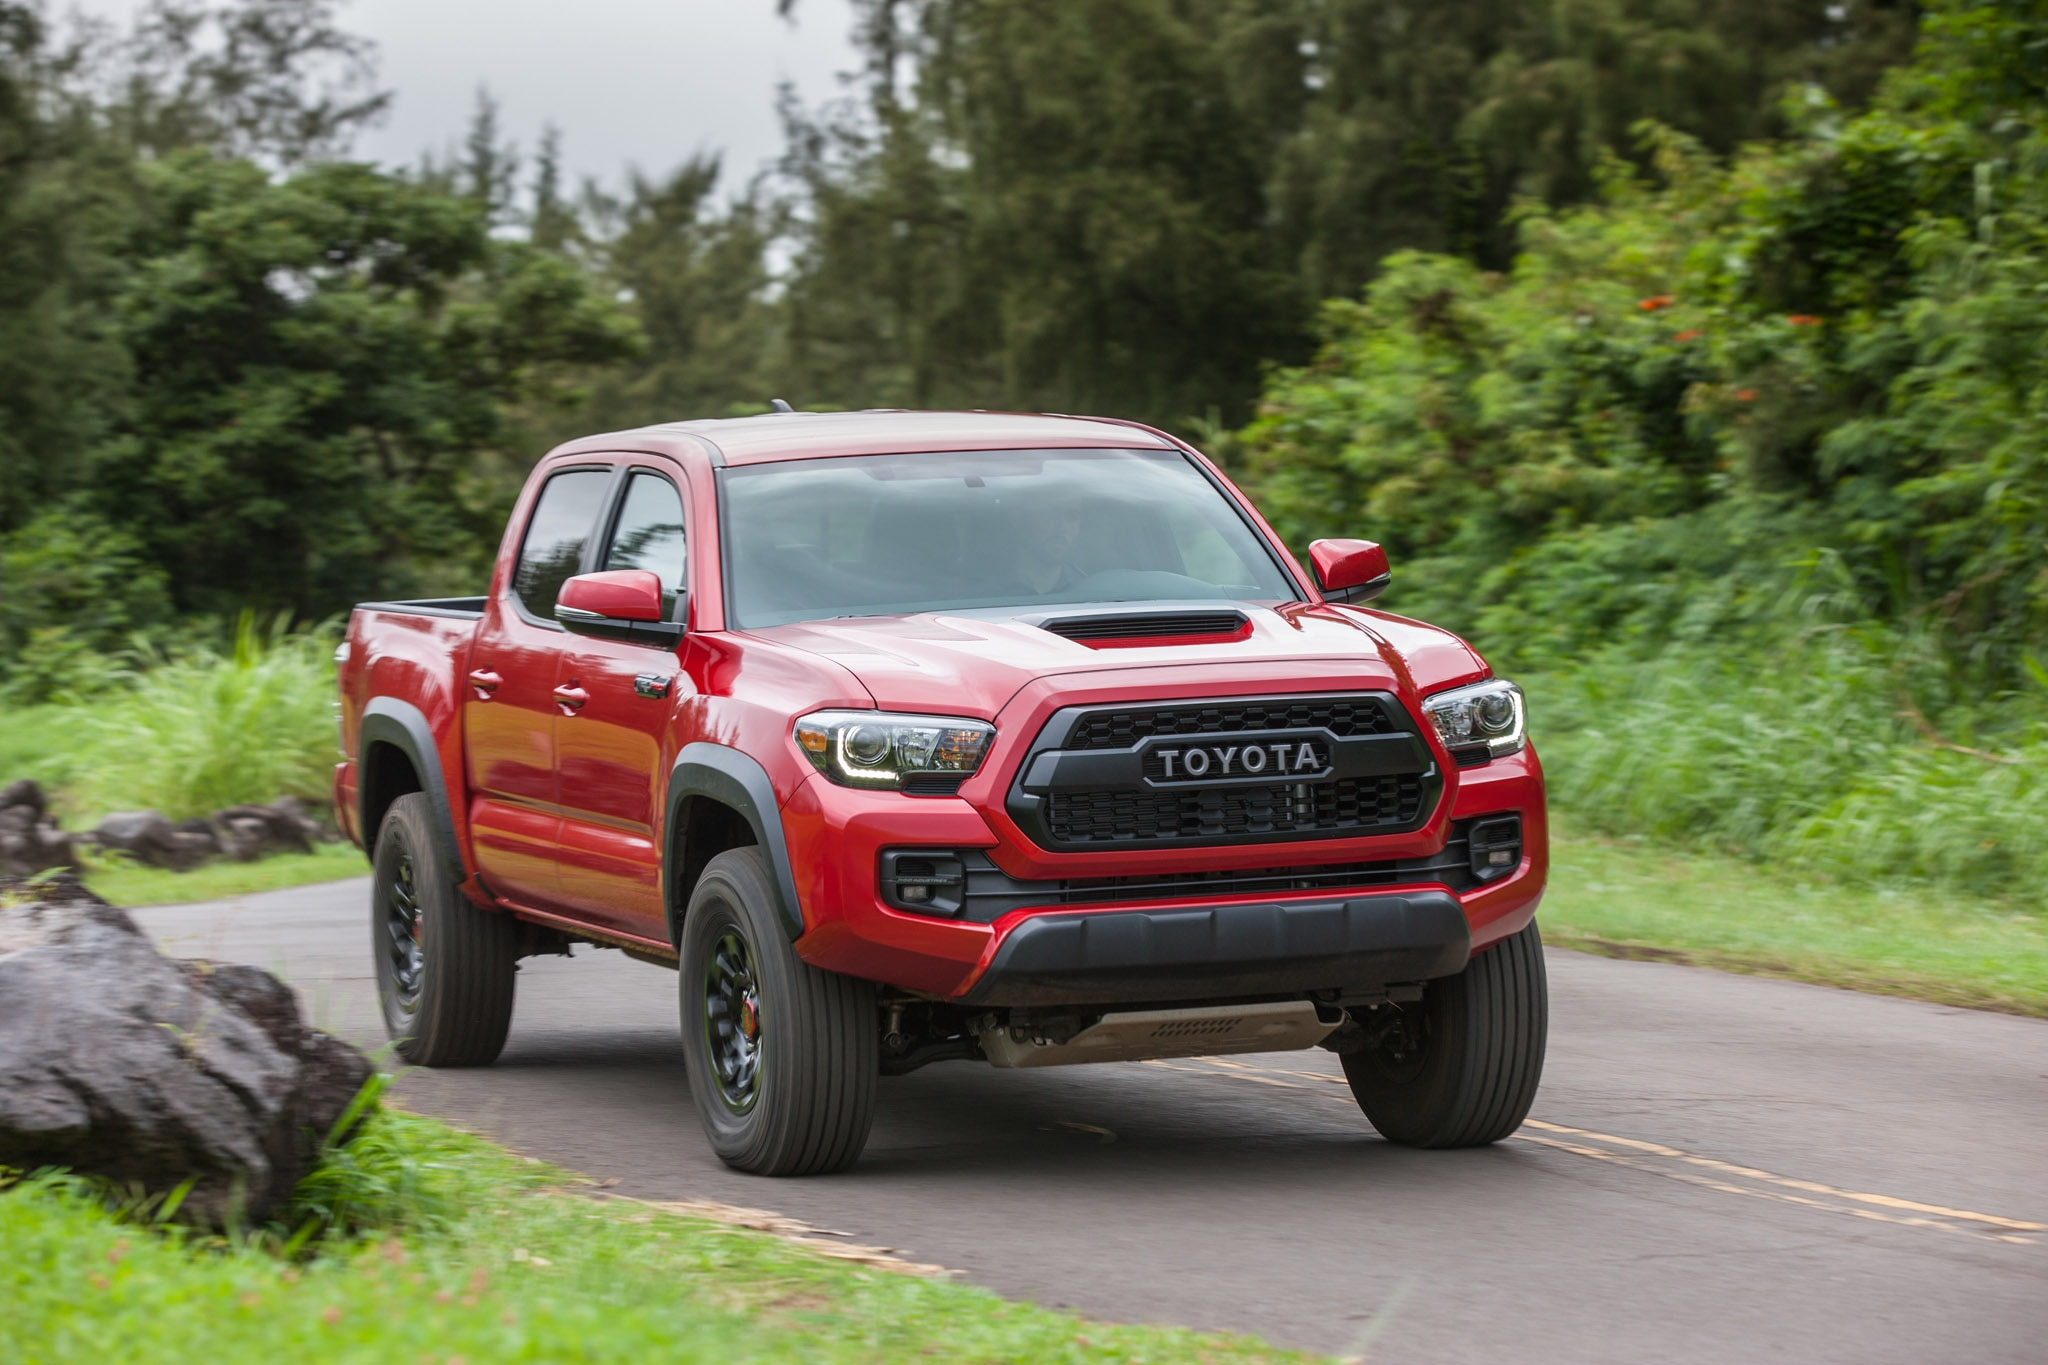 U S  Auto Sales Totaled 17 25-Million in 2017 | Automobile Magazine